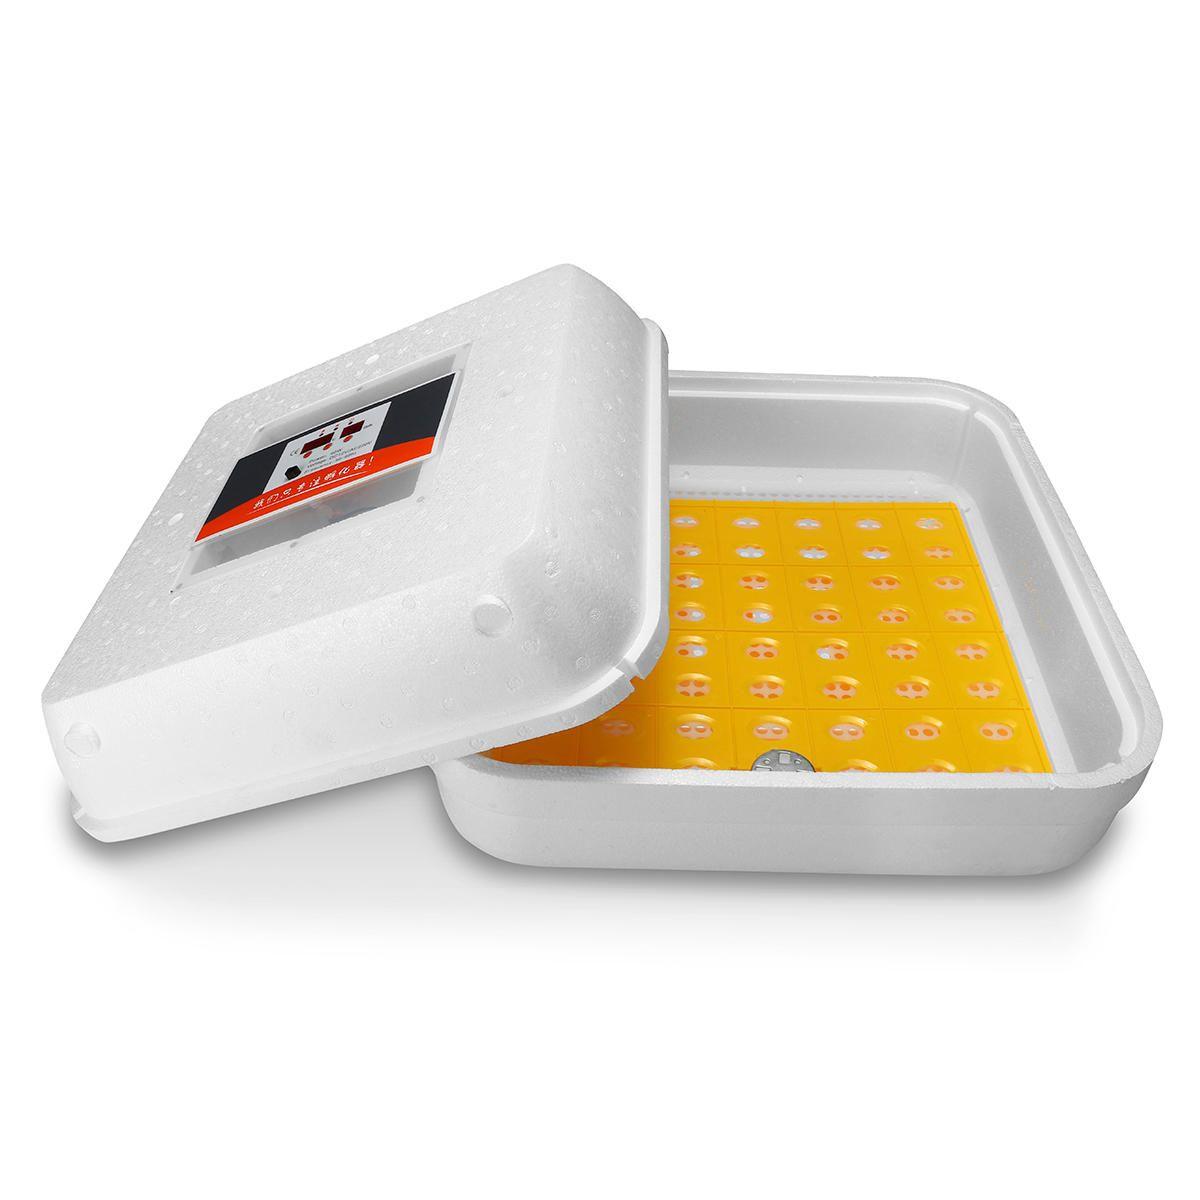 VYW US$92.18 55 Position Egg Incubator 110V-240V Automatic Poultry Hatcher